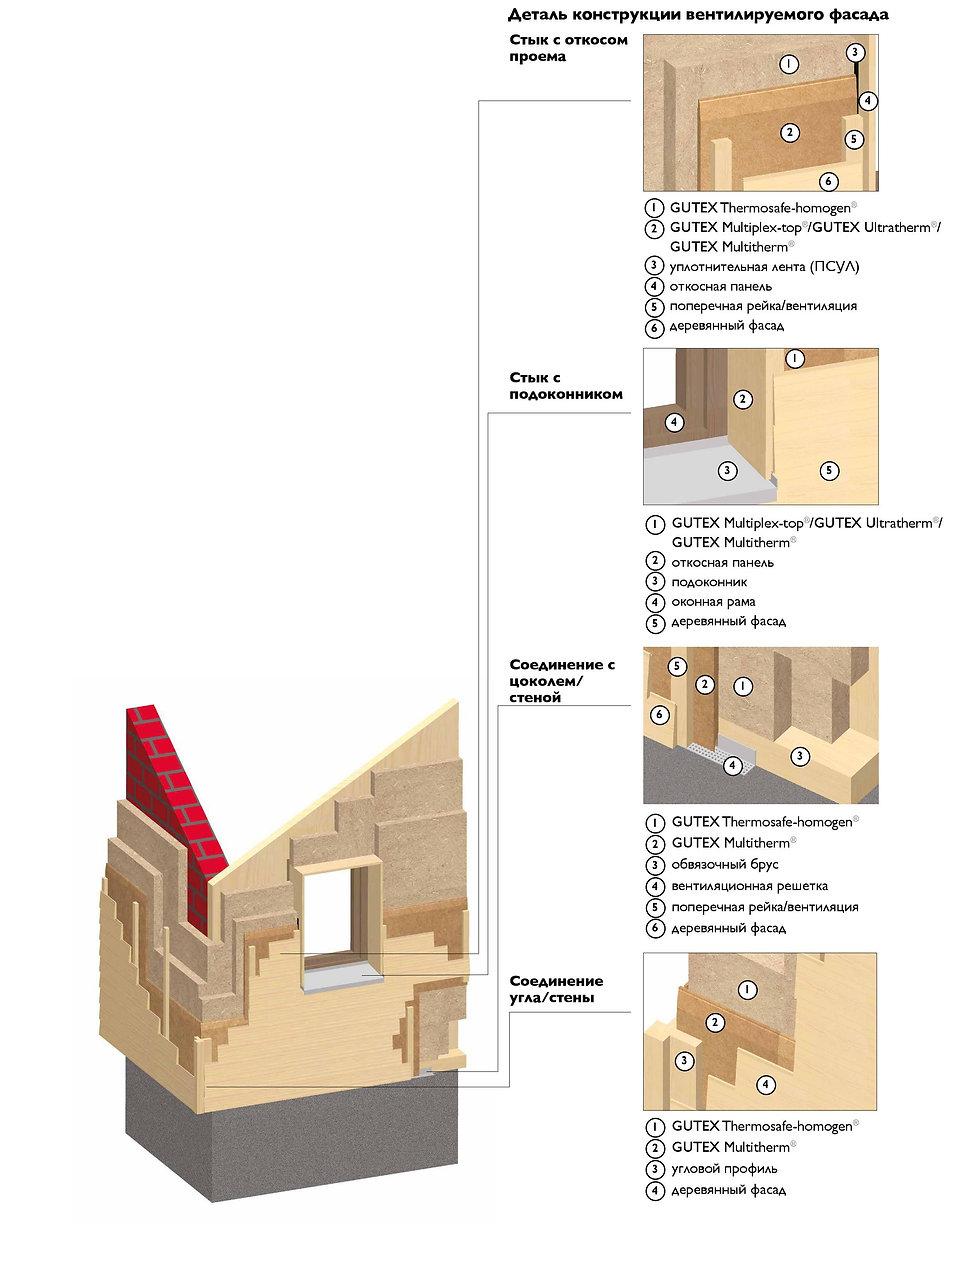 Утепление стен плитами GUTEX Thermosafe-homogen